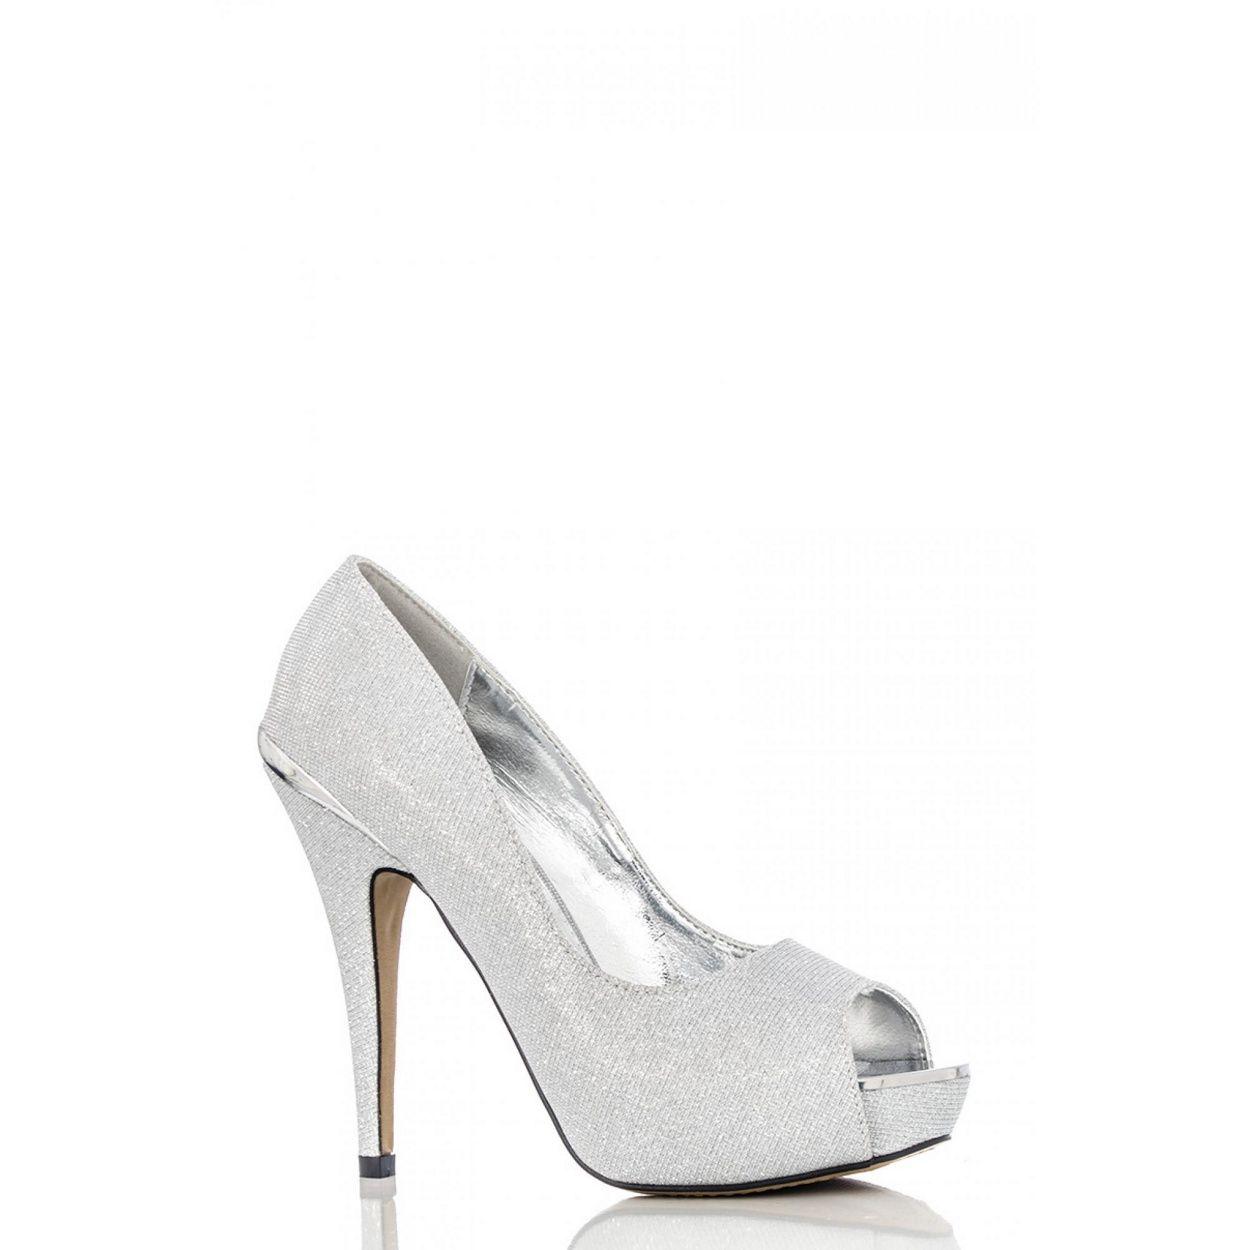 Black sandals debenhams - Quiz Silver Shimmer Platform Shoes At Debenhams Com